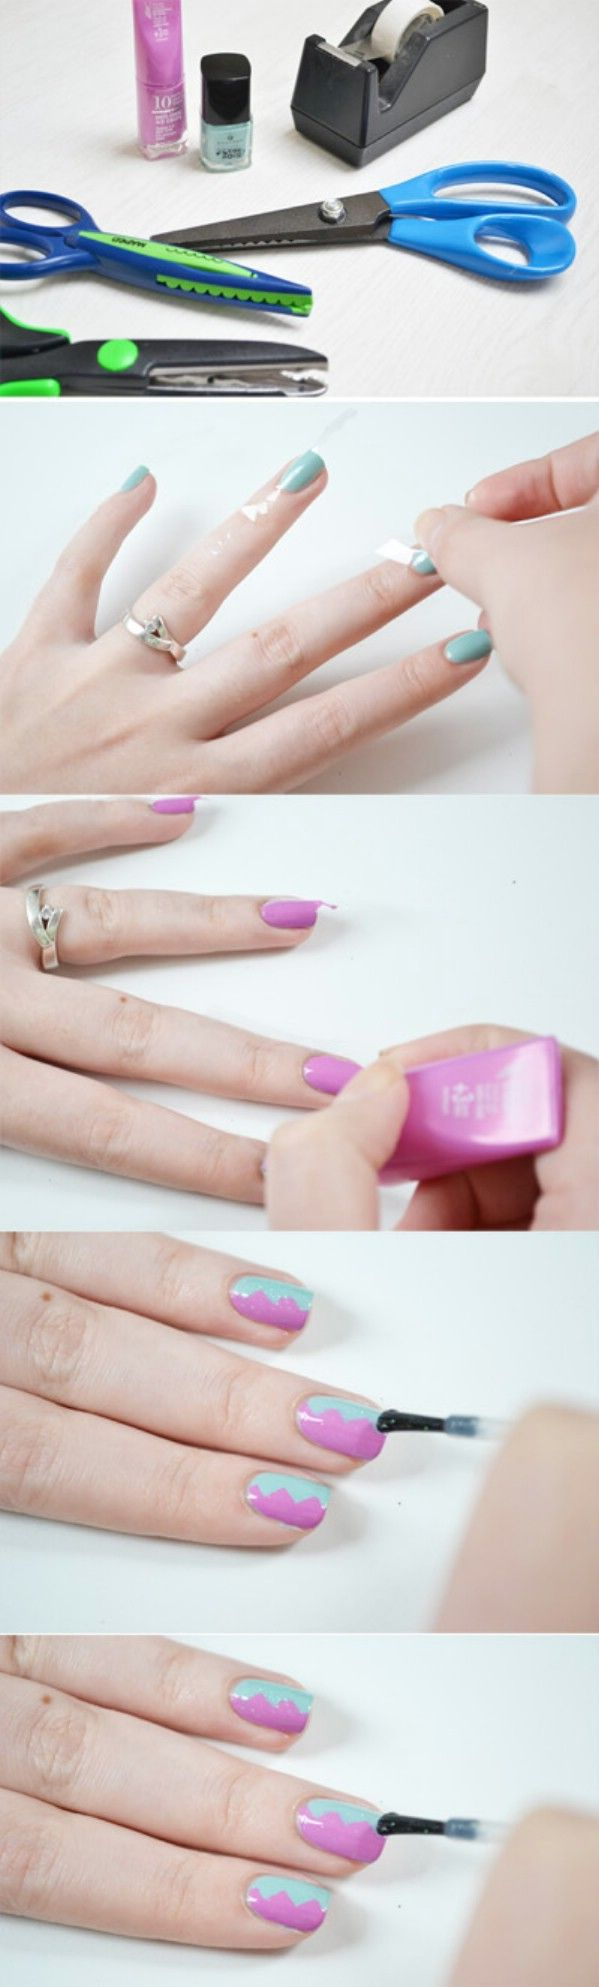 966 best Nails an toenails images on Pinterest | Nail scissors, Cute ...